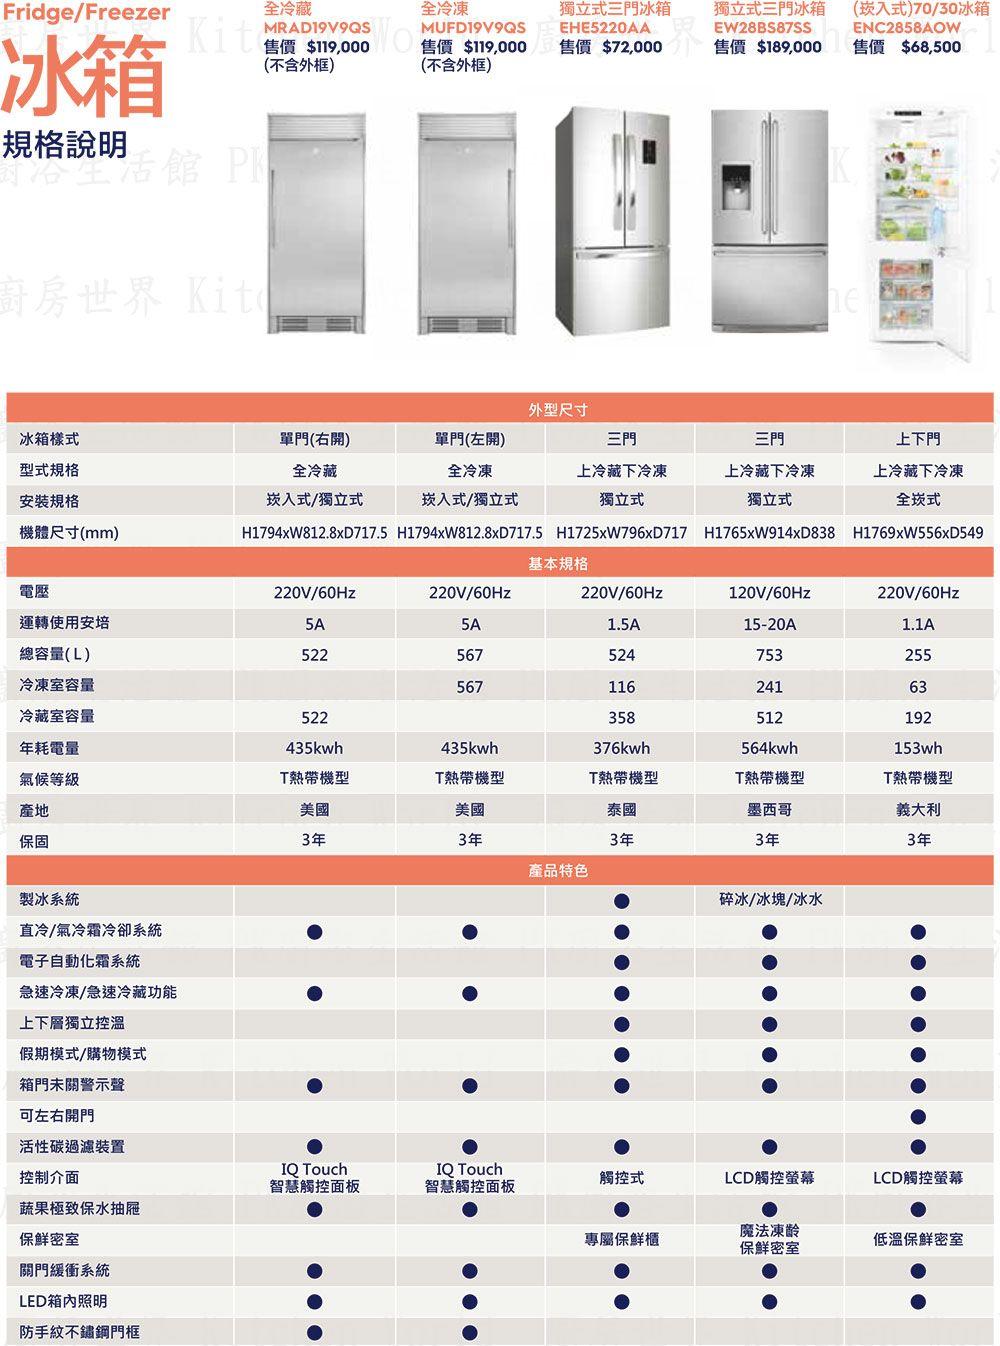 PK/goods/Electrolux/Fridge/DM2.jpg